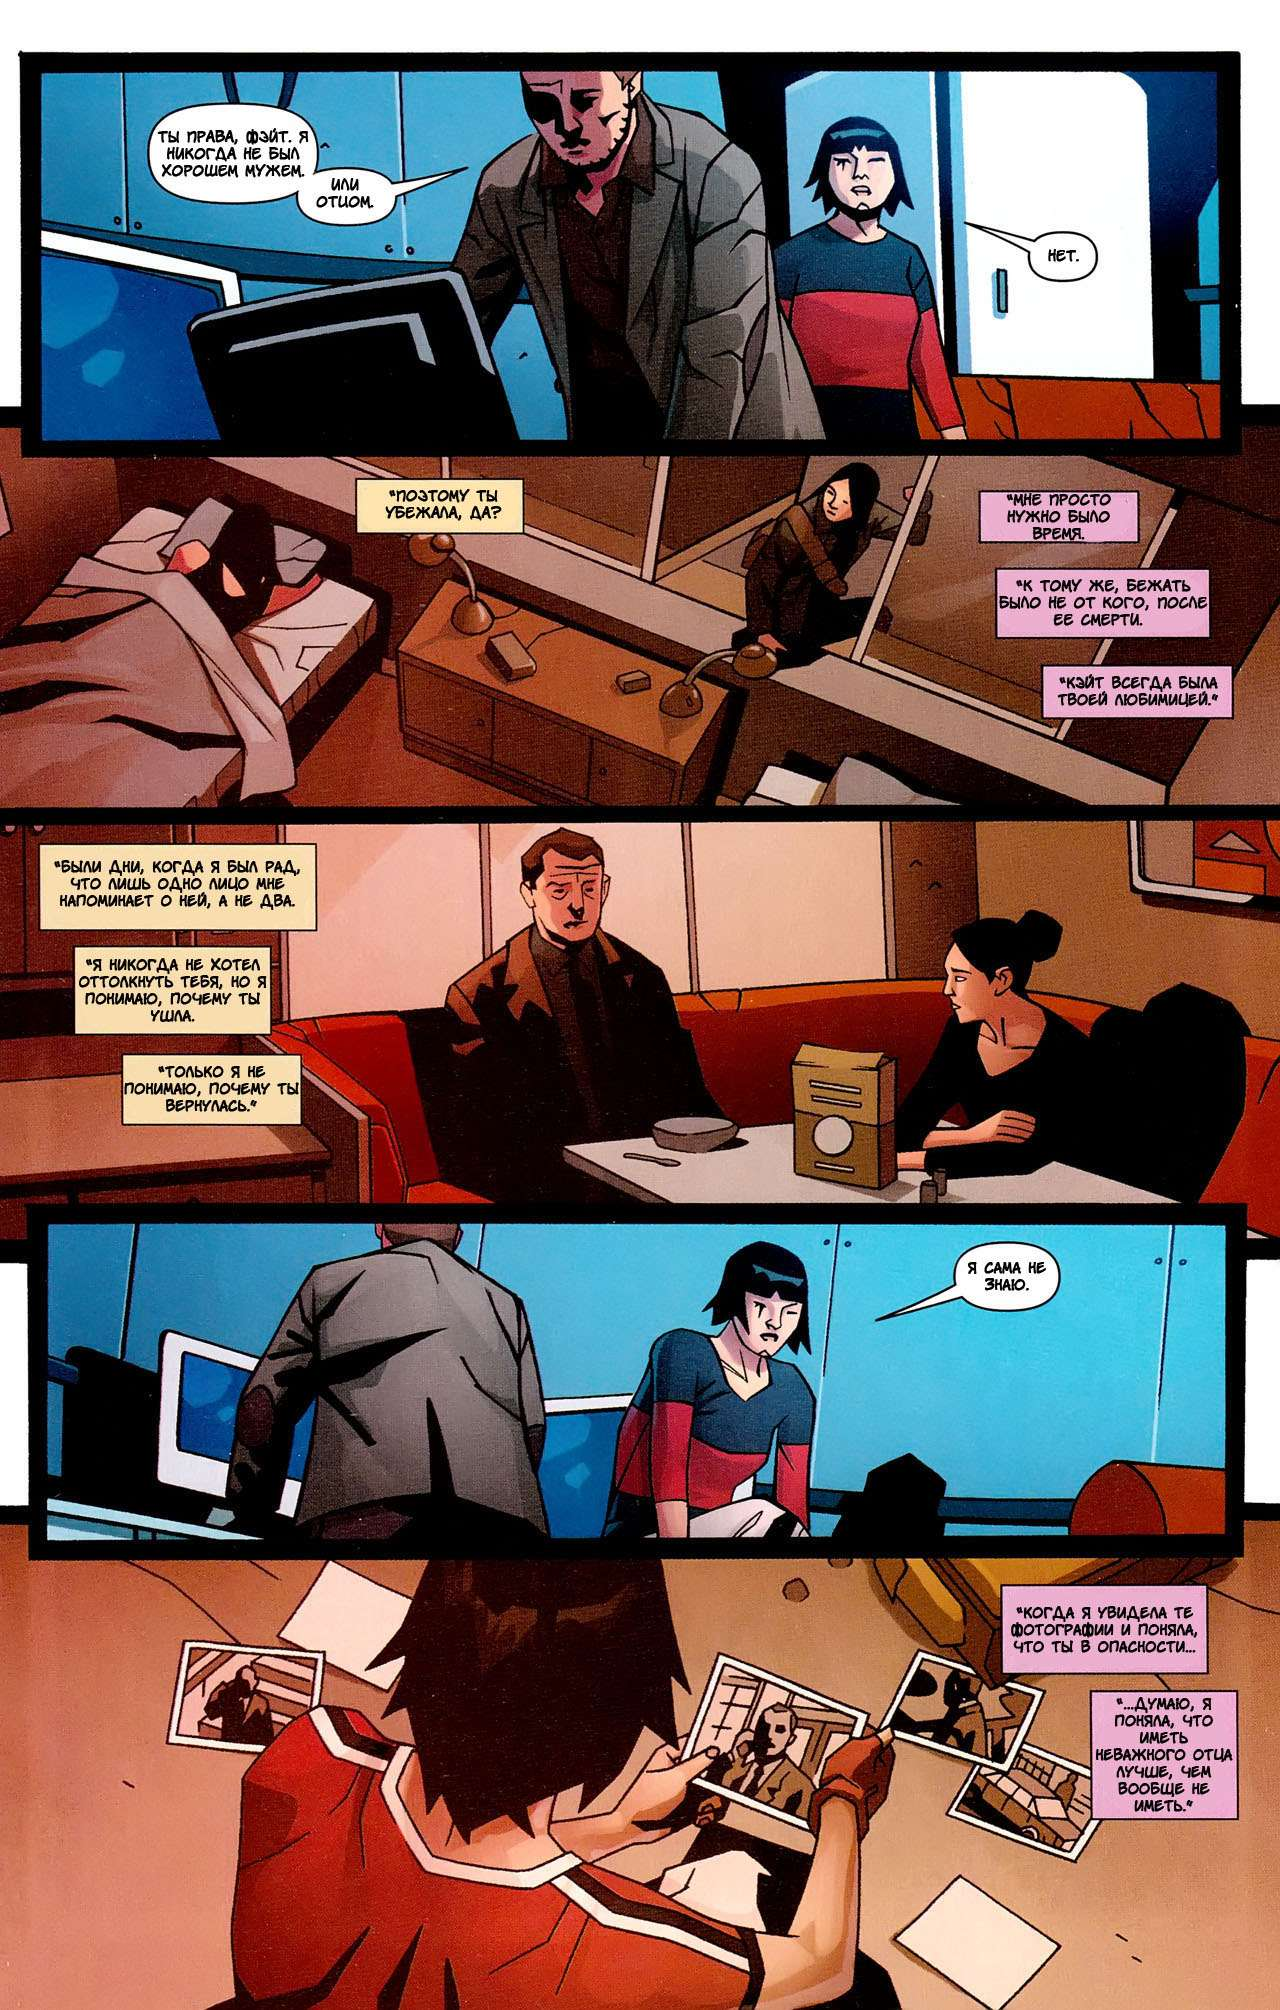 mirrors-edge-05-pg-11